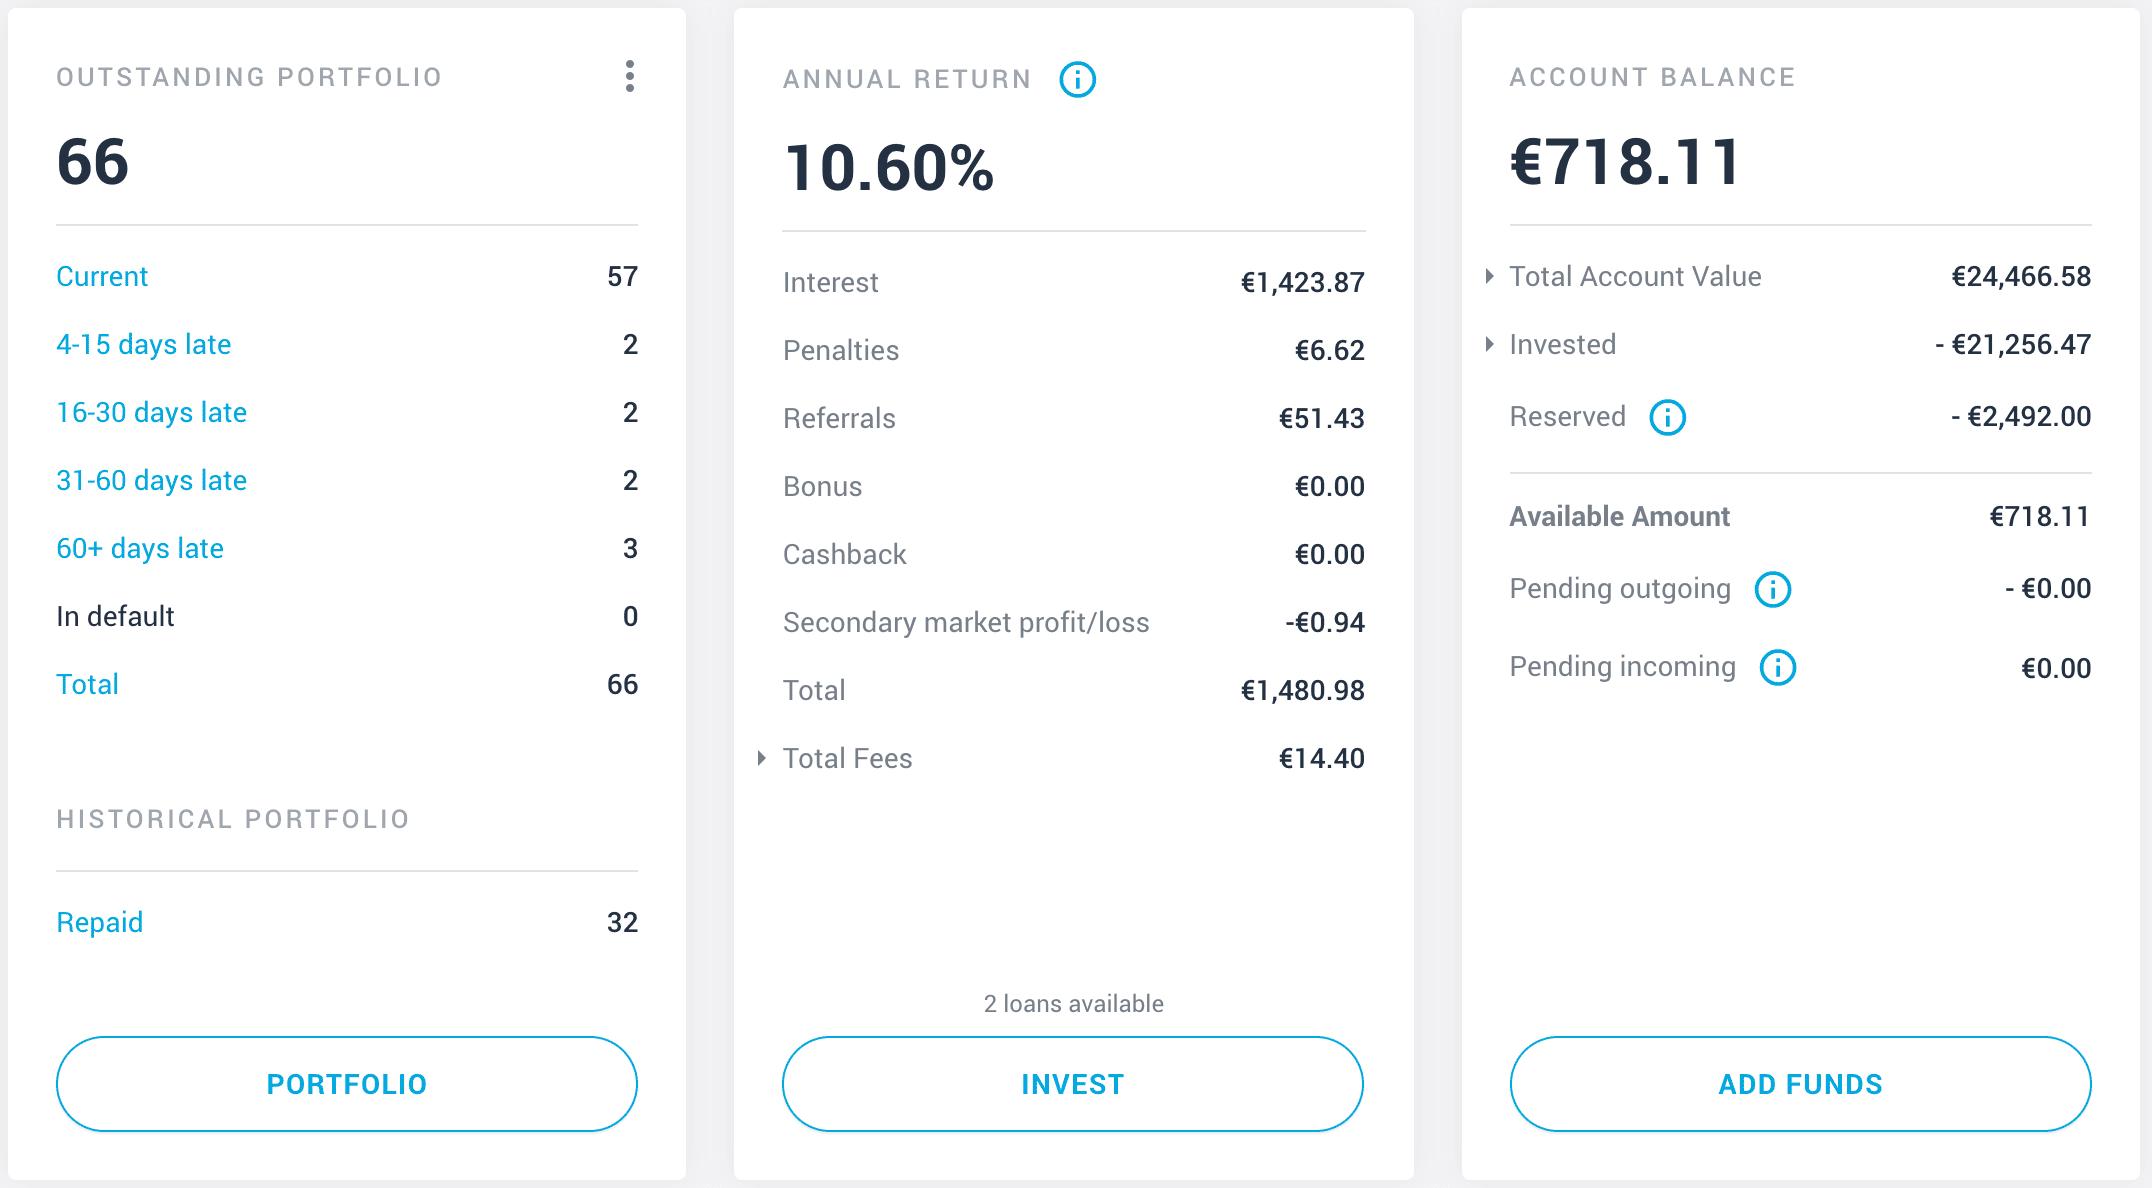 My EstateGuru Dashboard in May 2021